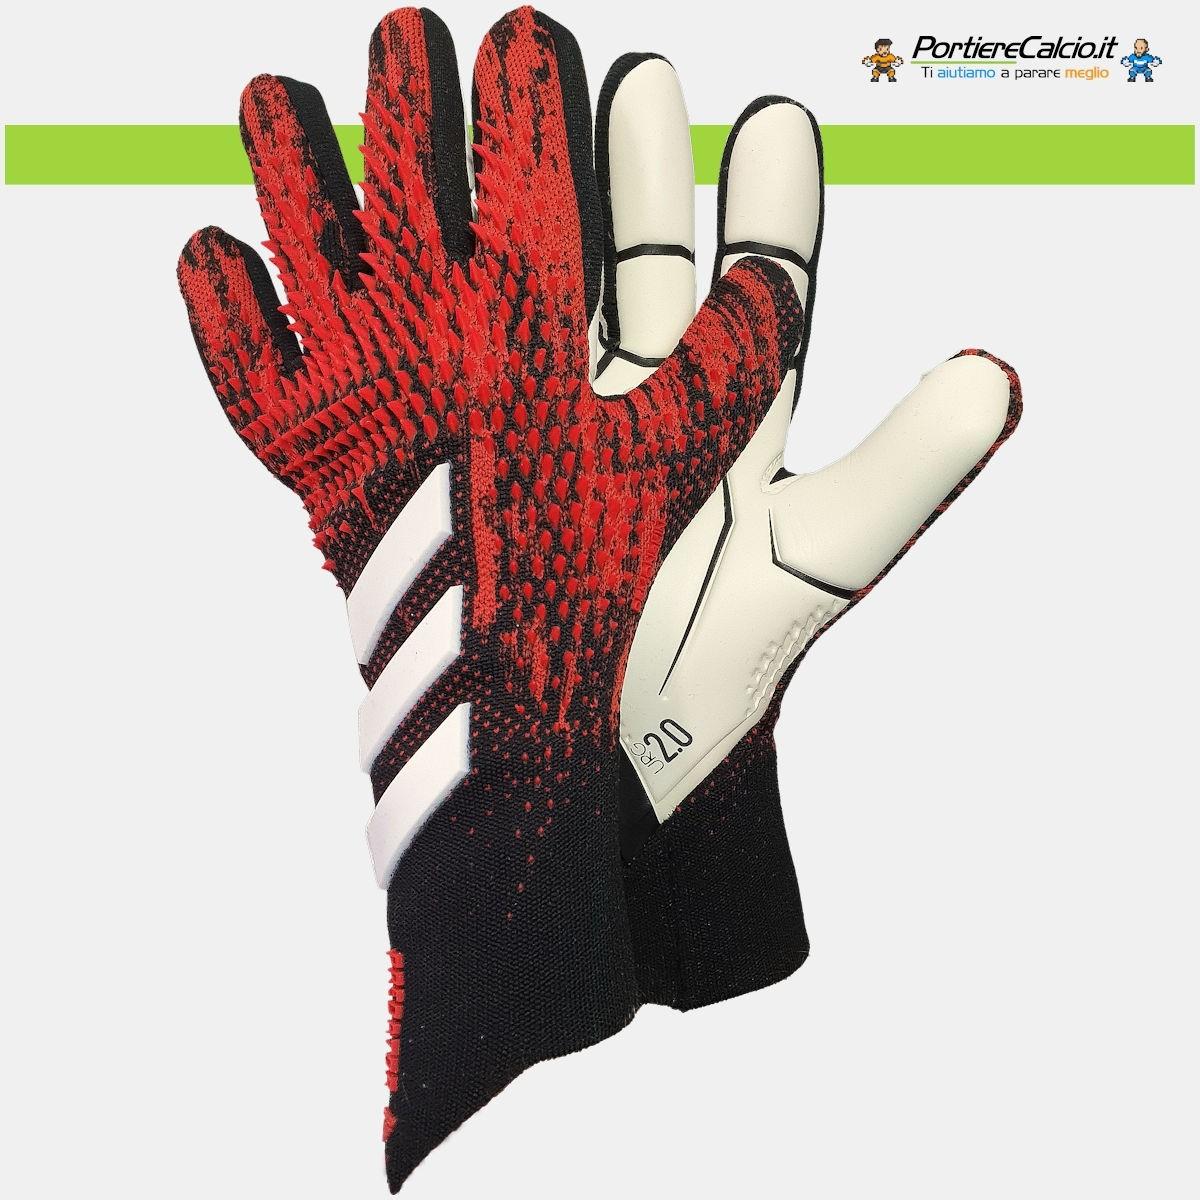 Donnarumma usa i guanti Adidas Predator 20 Pro Mutator Pack